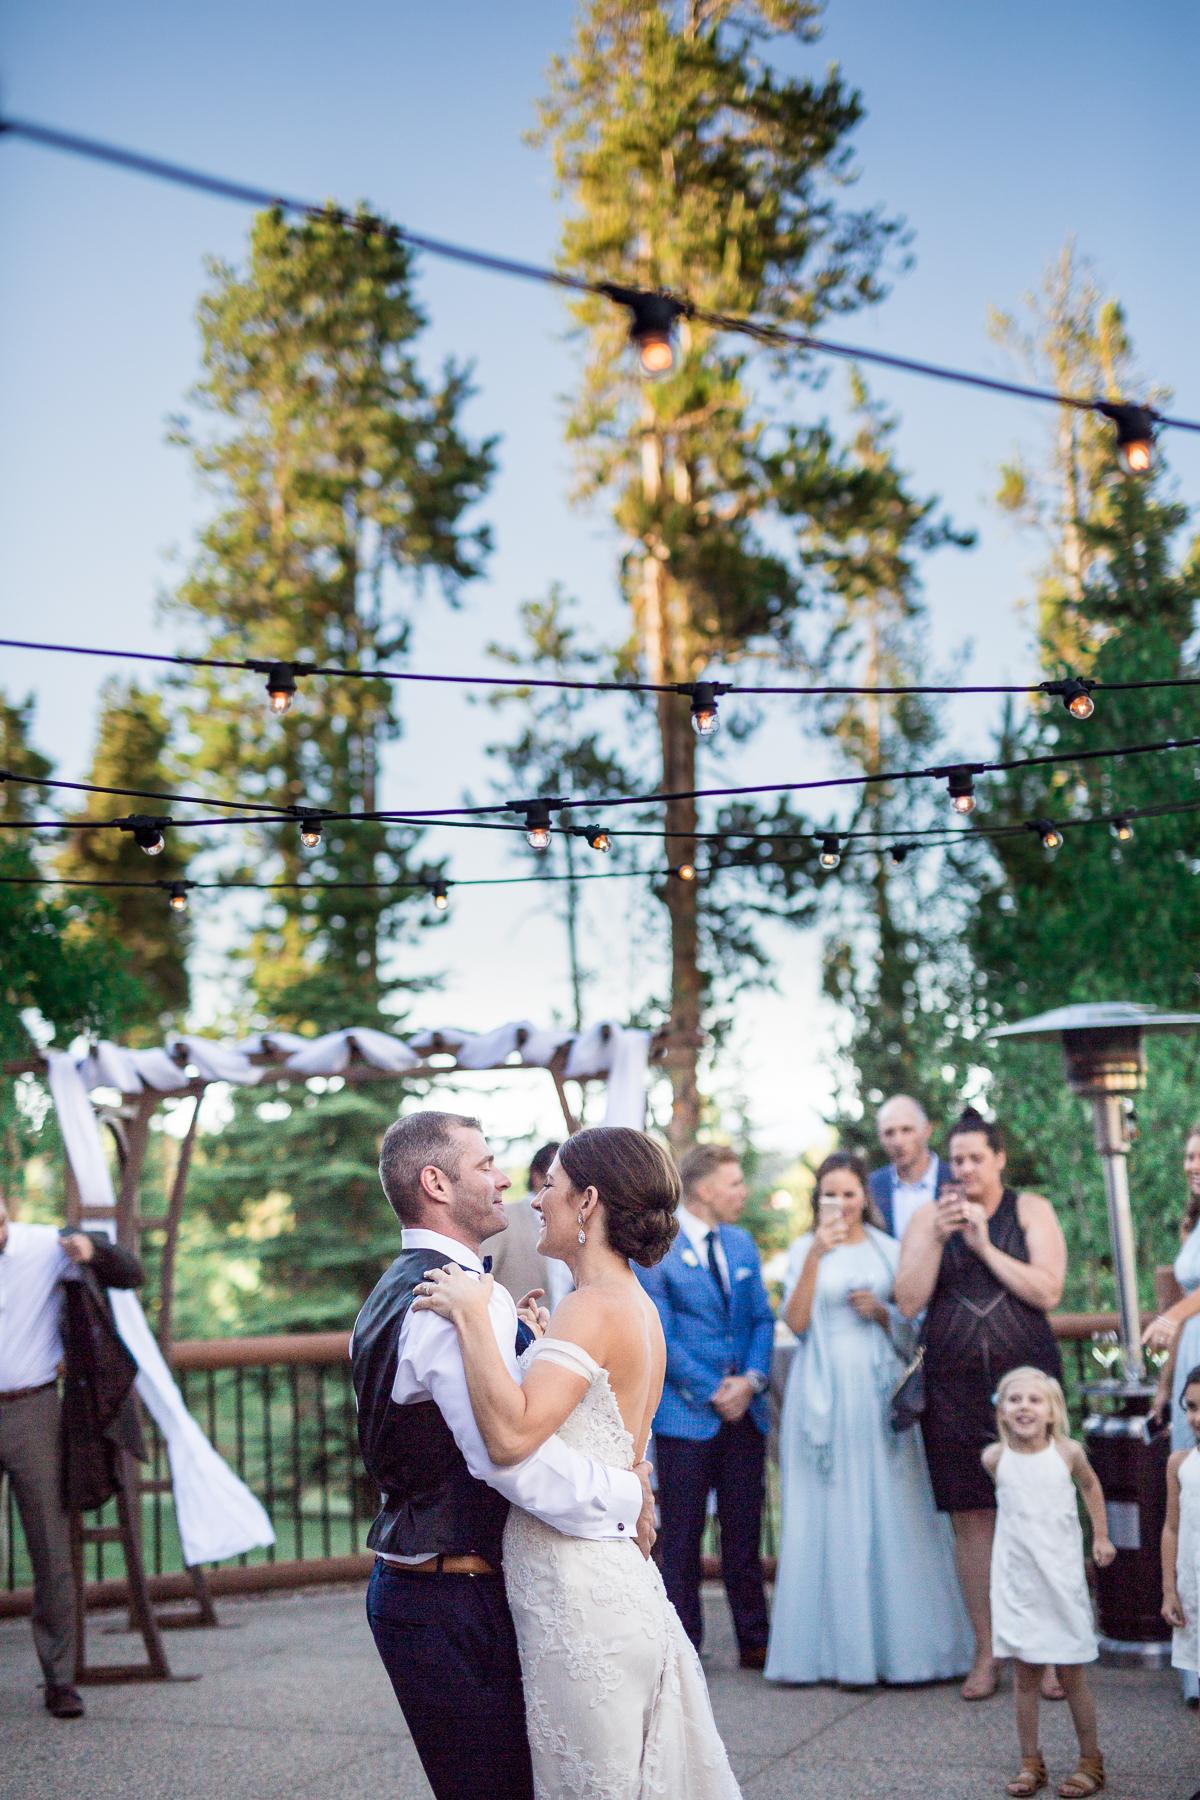 StaciDesign-Colorado-Wedding-5593.jpg